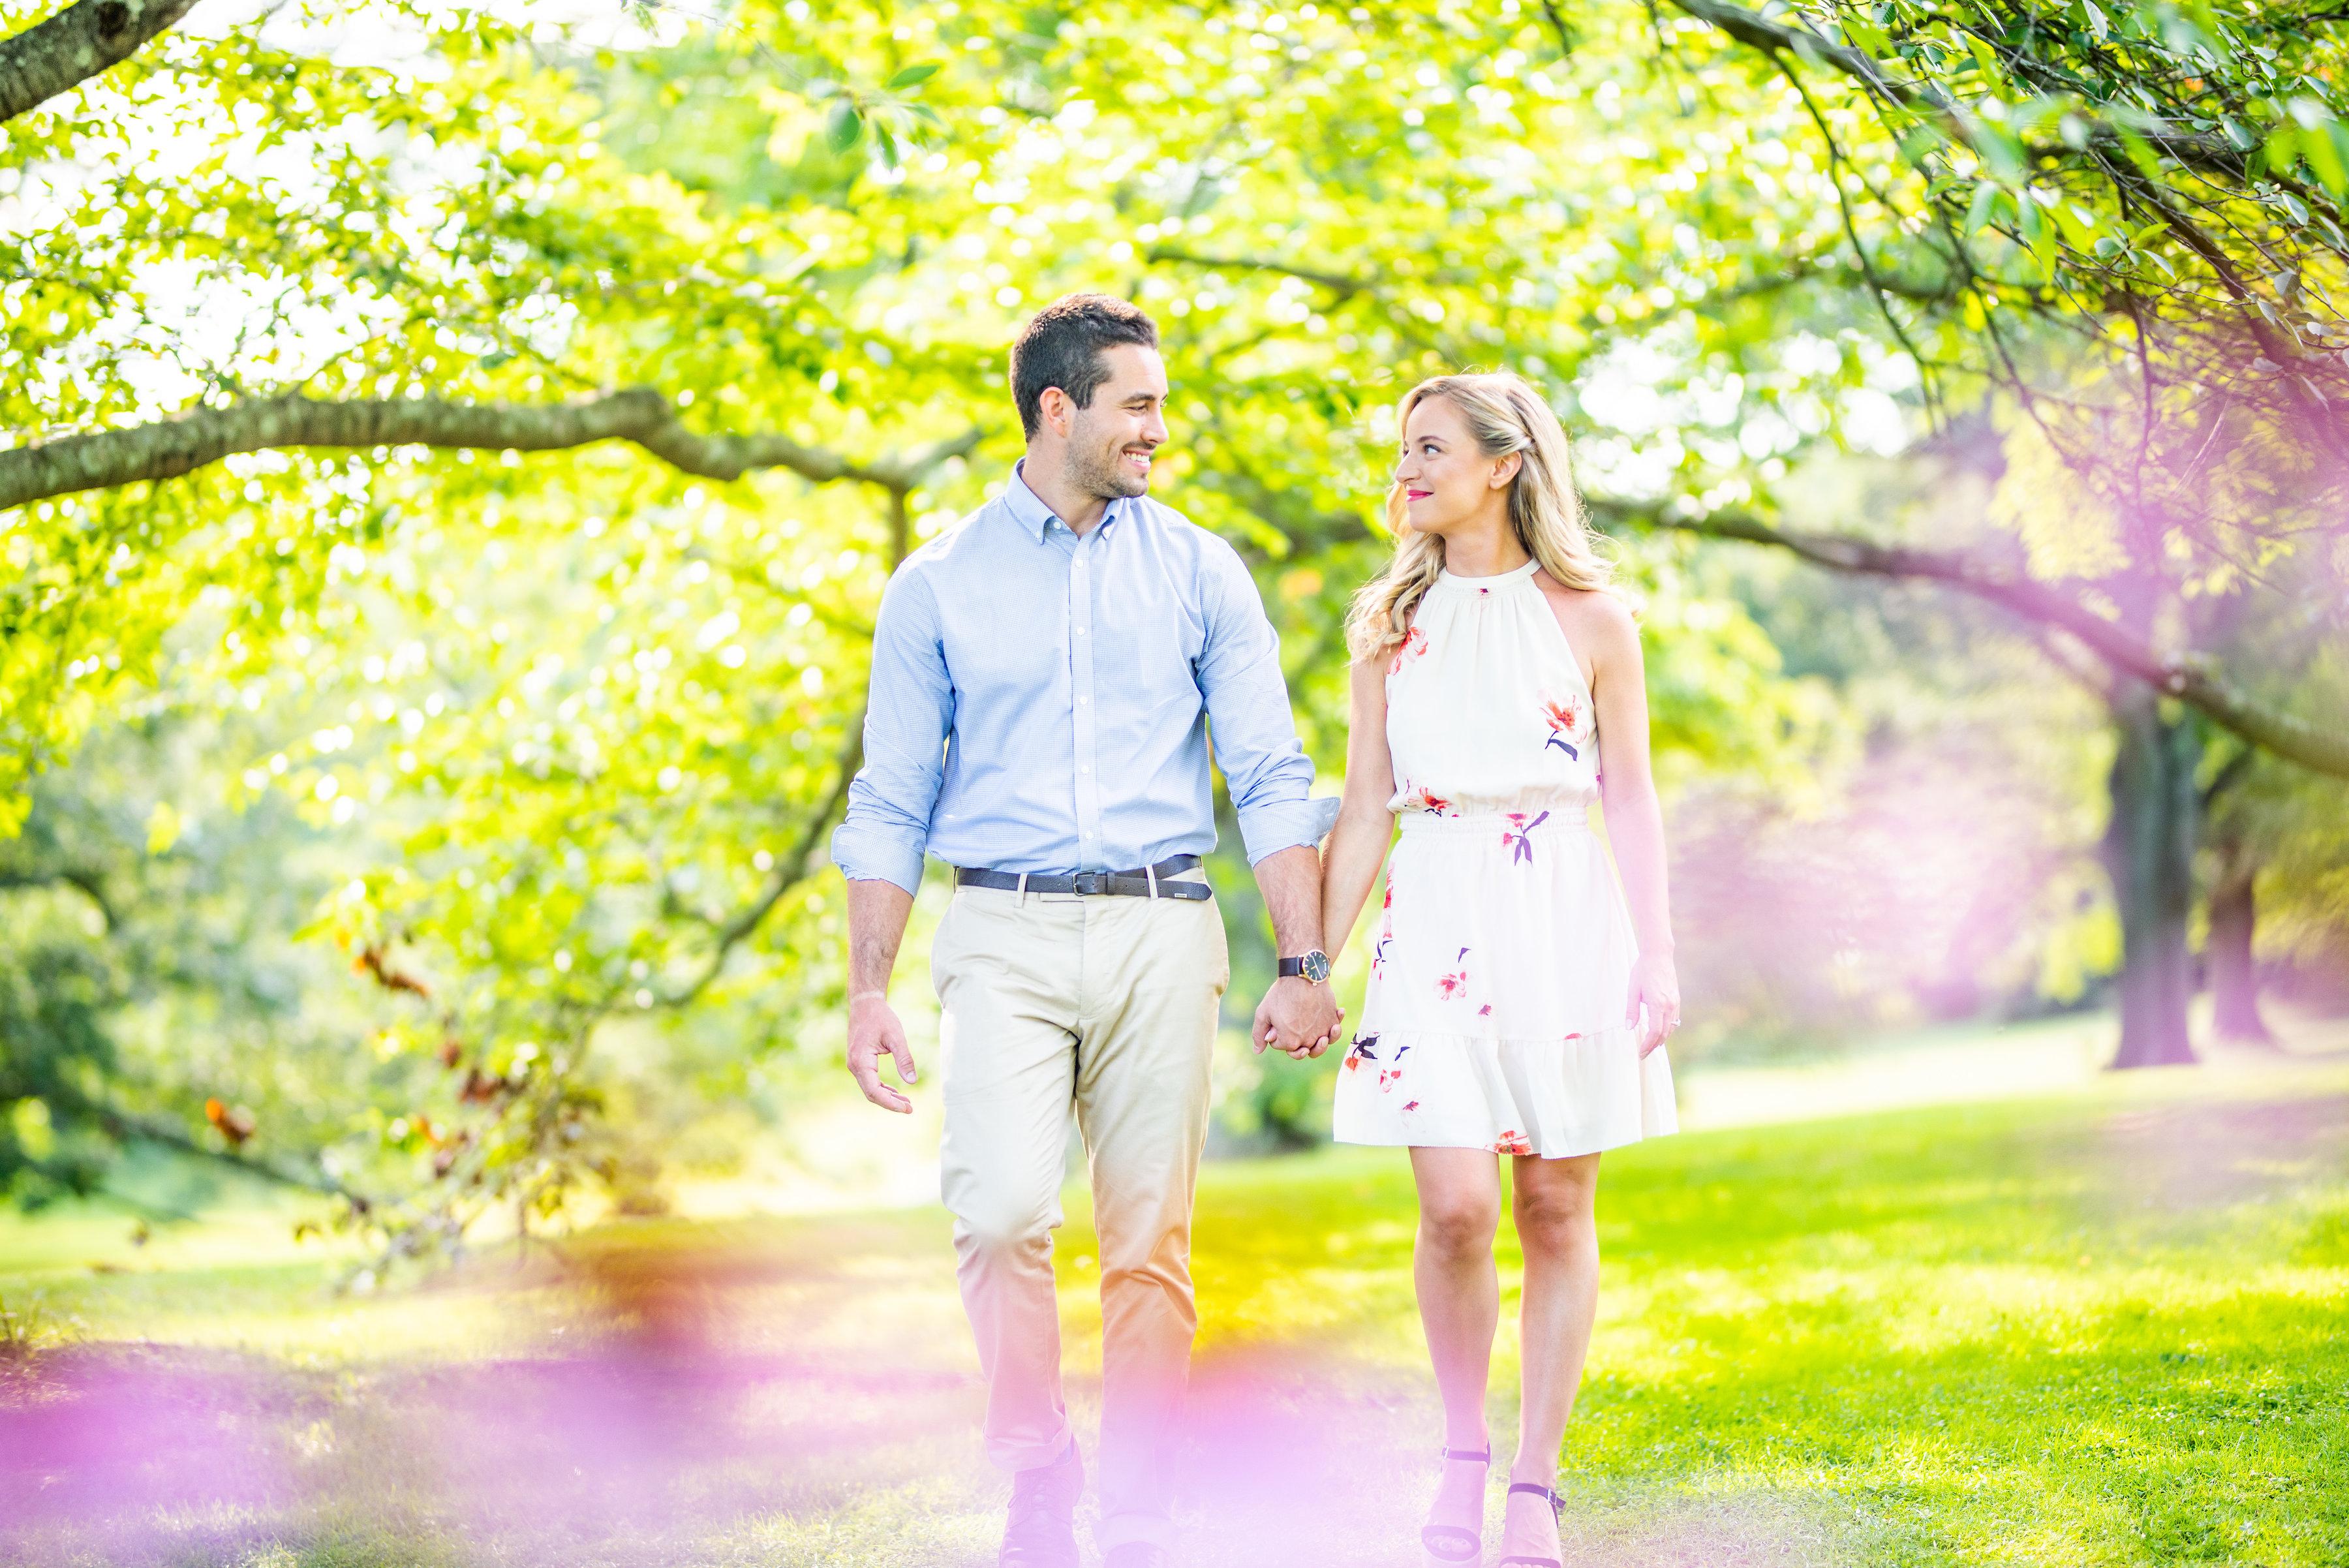 Planting Fields Arboretum Engagement Shoot | Oyster Bay Engagement Shoot | Long Island Wedding Photographer20